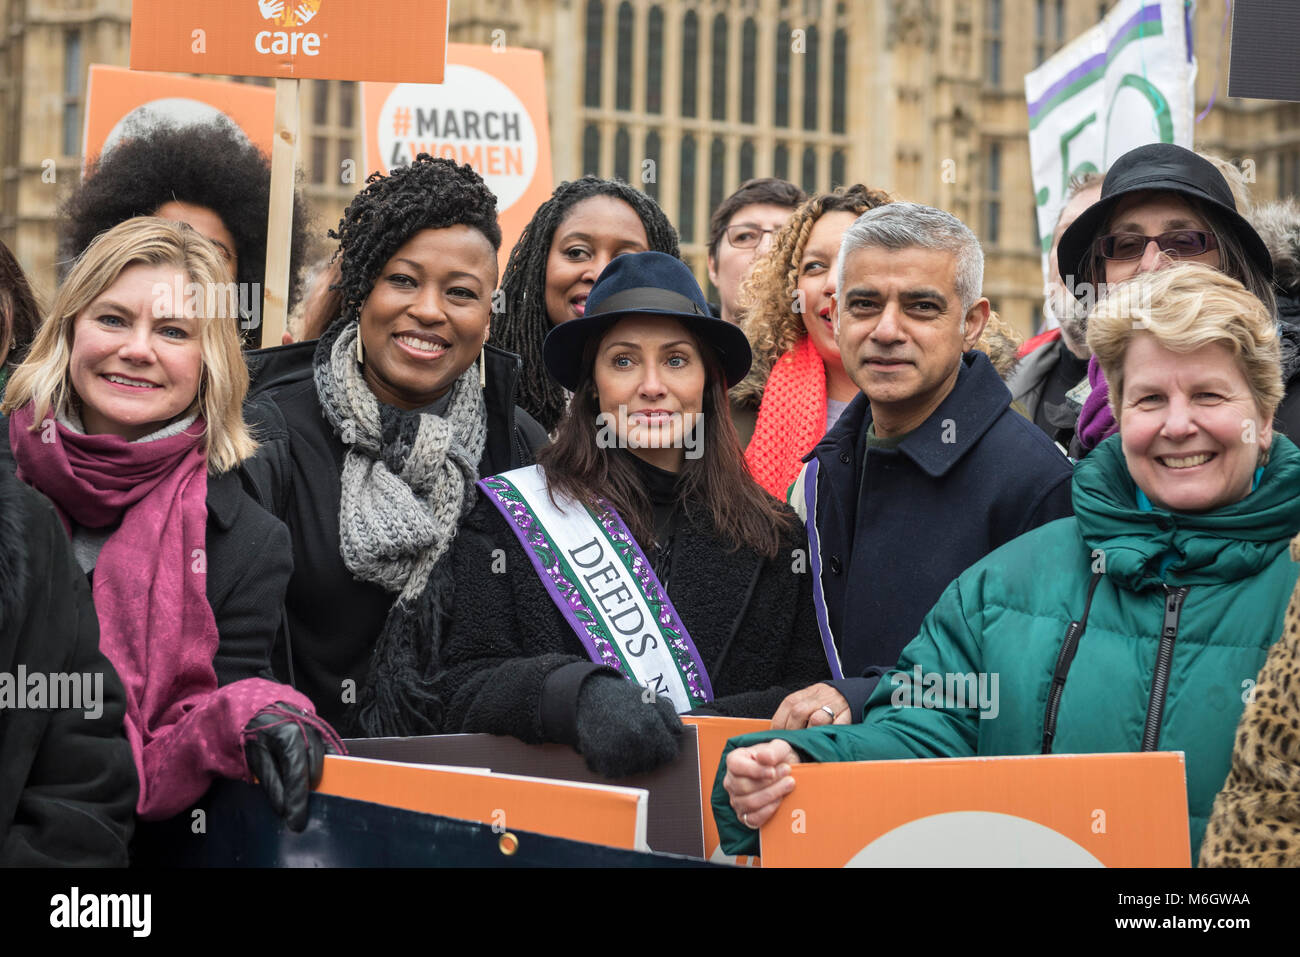 London, UK.  4 March 2018.  Justine Greening, MP, Natalie Imbruglia, singer, Sadiq Khan, Mayor of London and Sandi - Stock Image